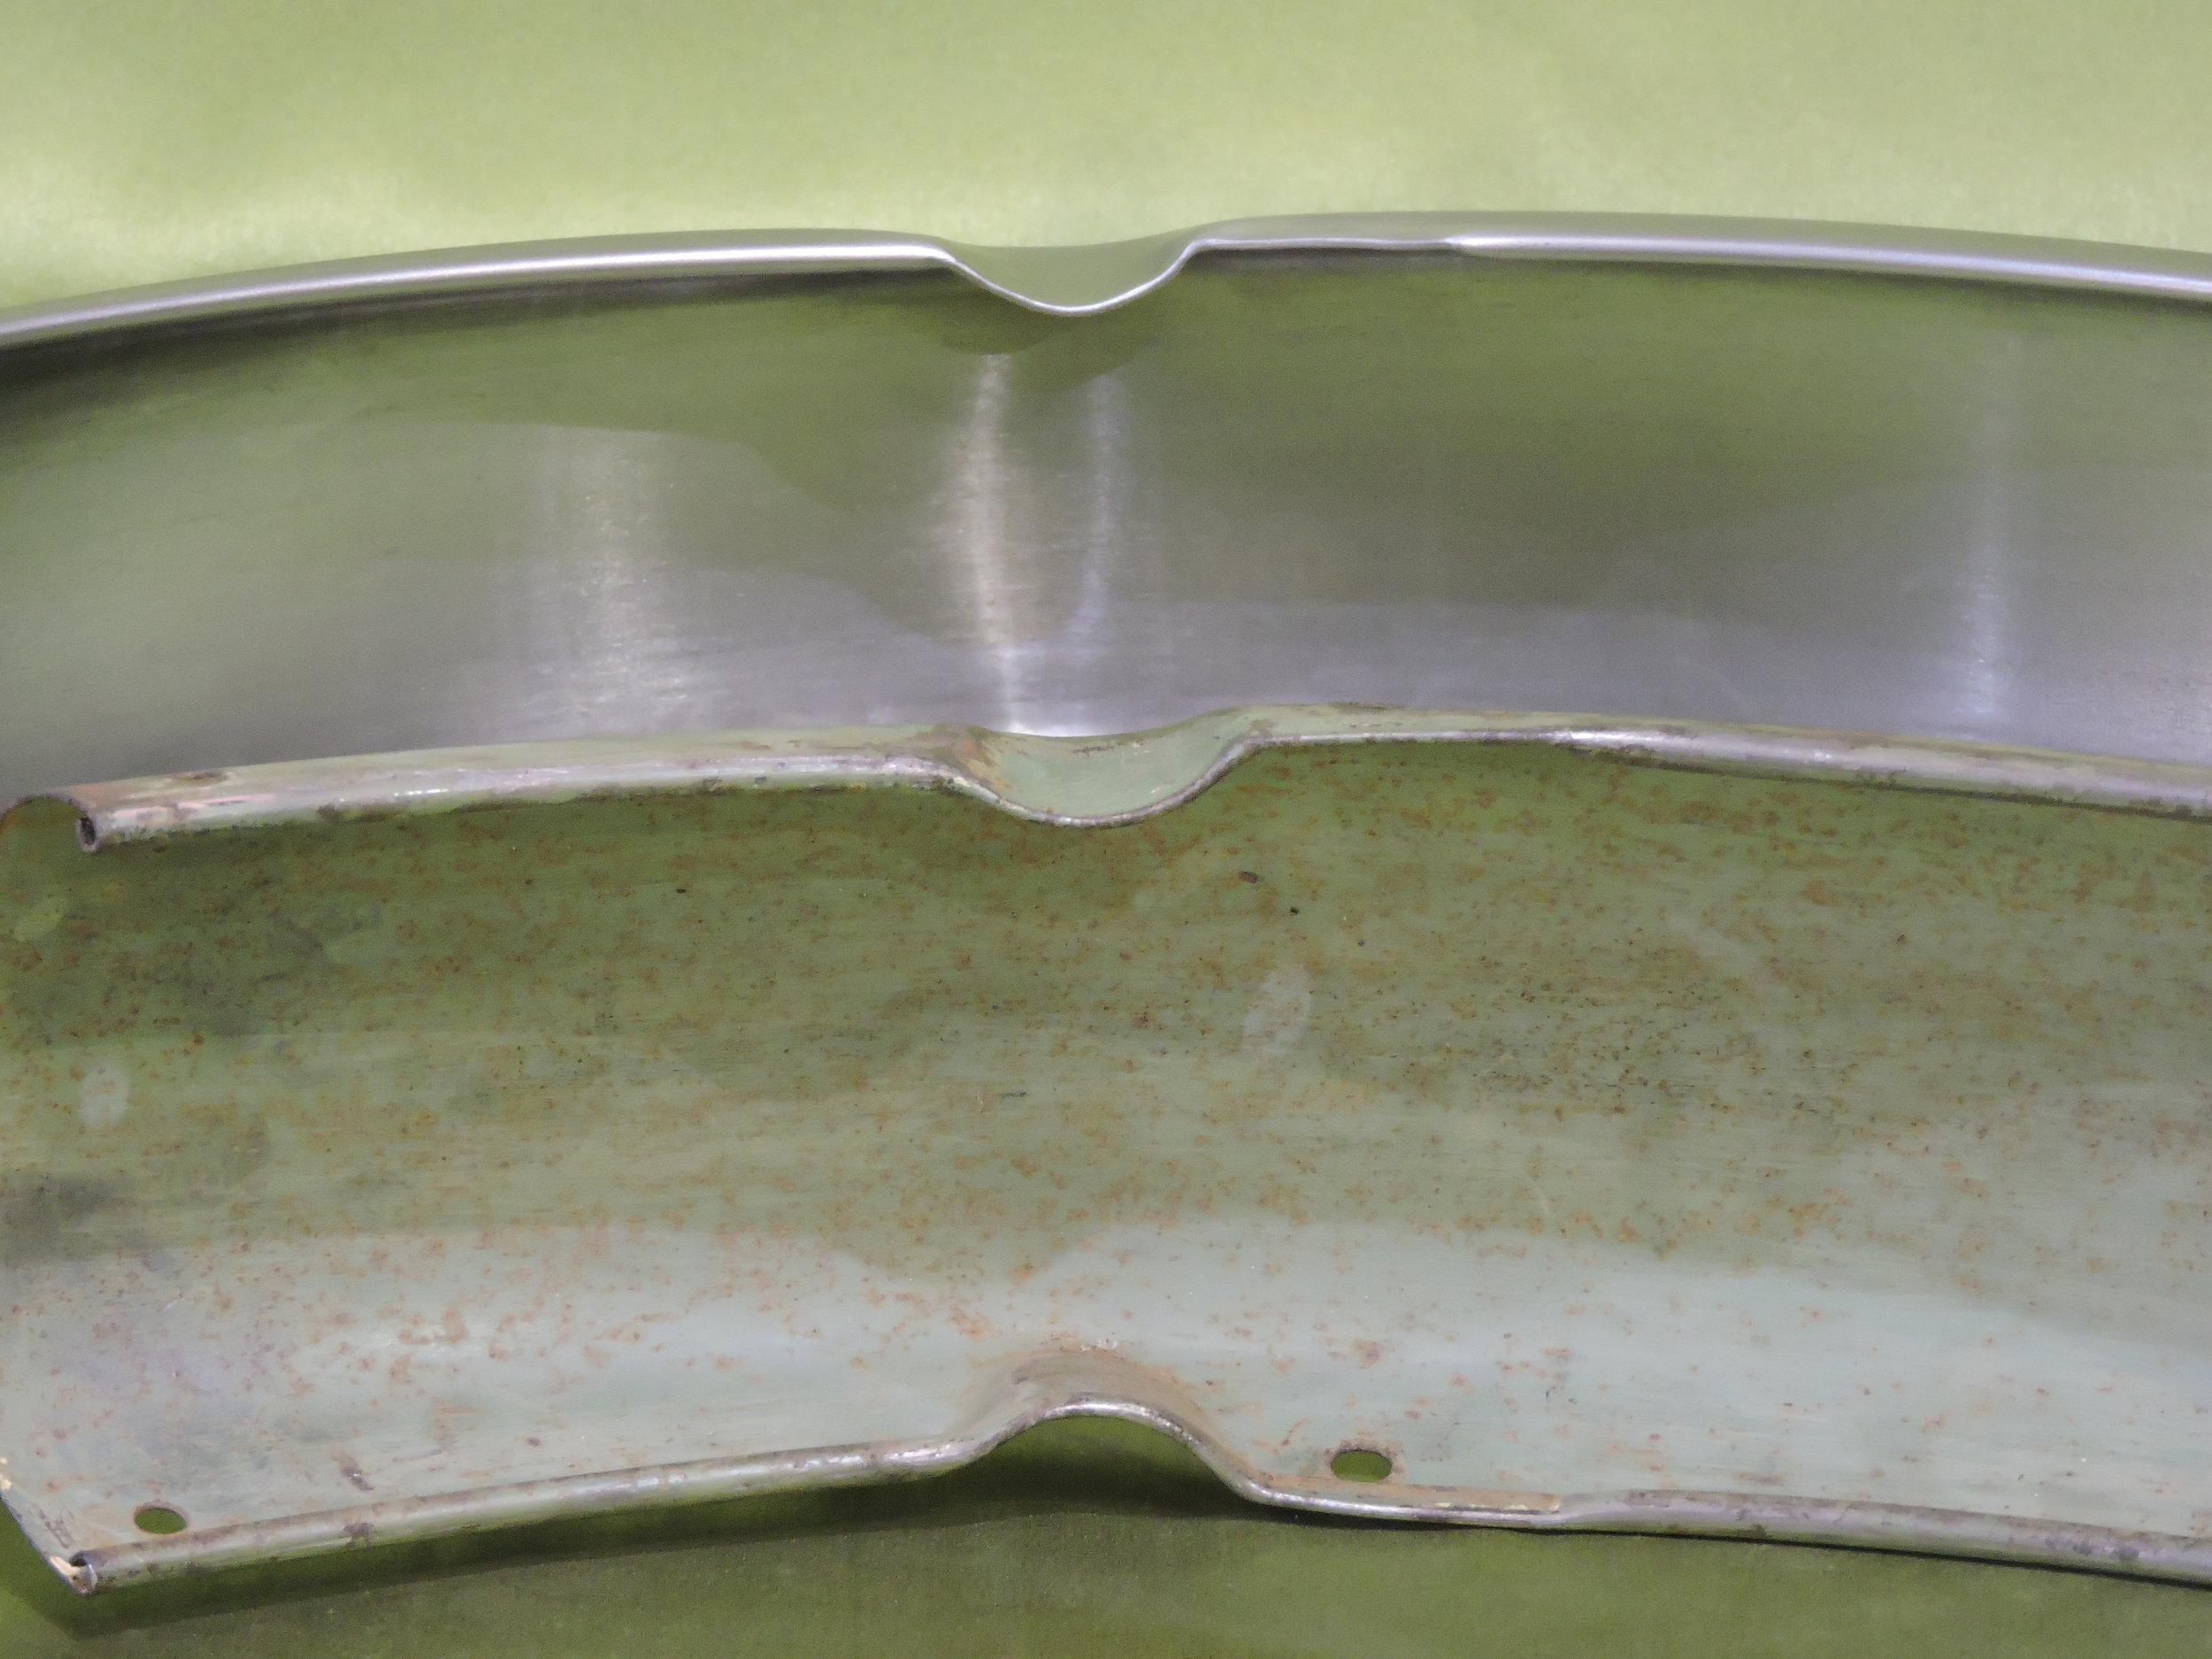 11 BSA Bantam plunger front (12).JPG